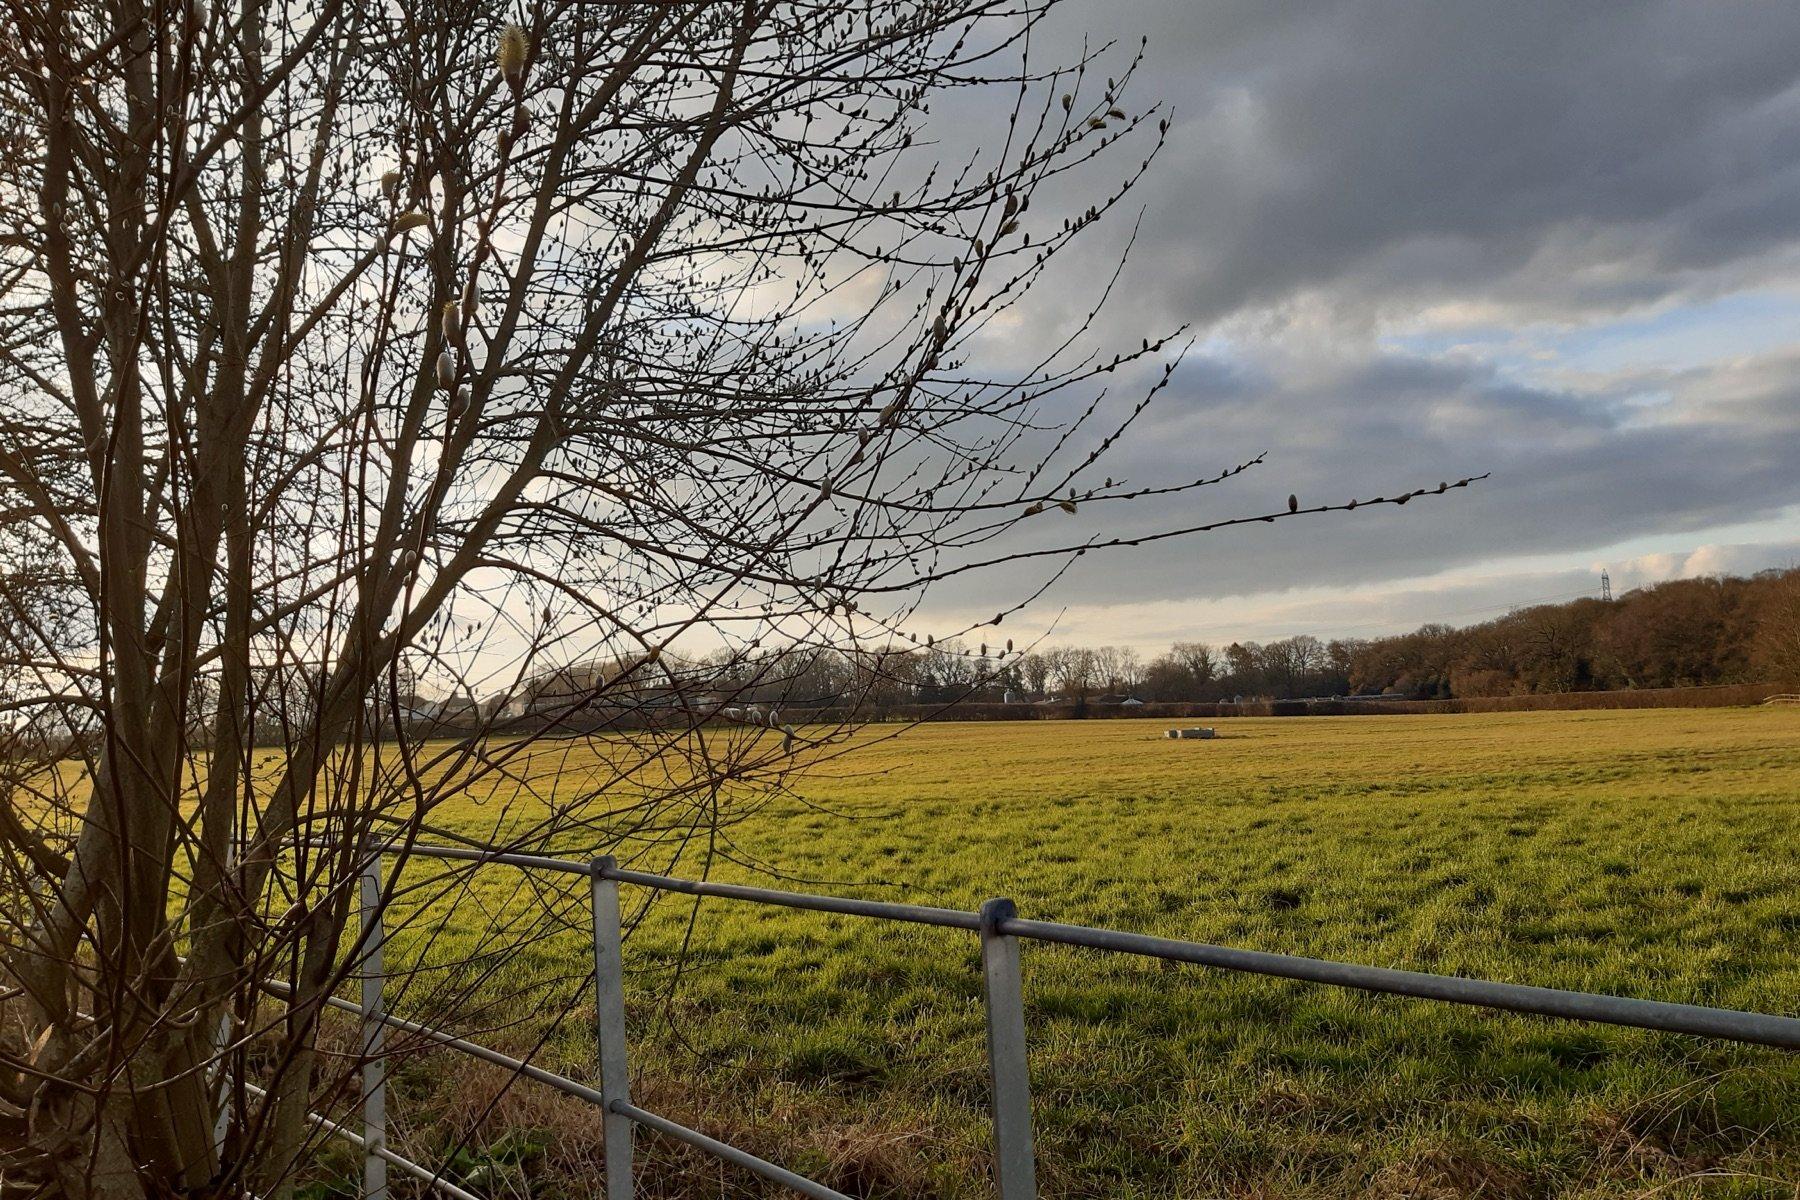 farm-girl-fields-holt-wimborne-shaftsbury